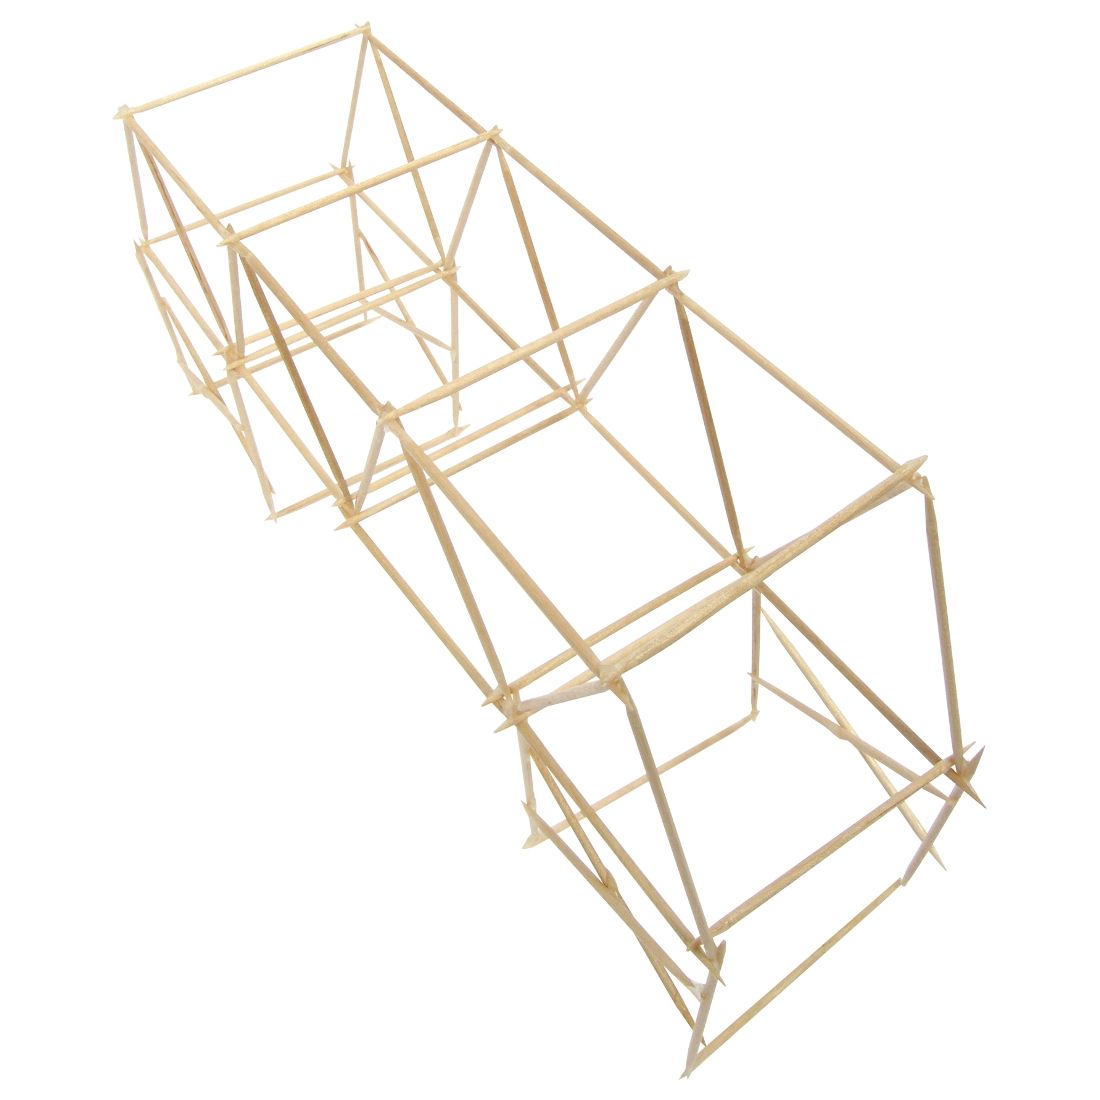 1100x1100 Toothpick Bridges Maker Project (W42966)